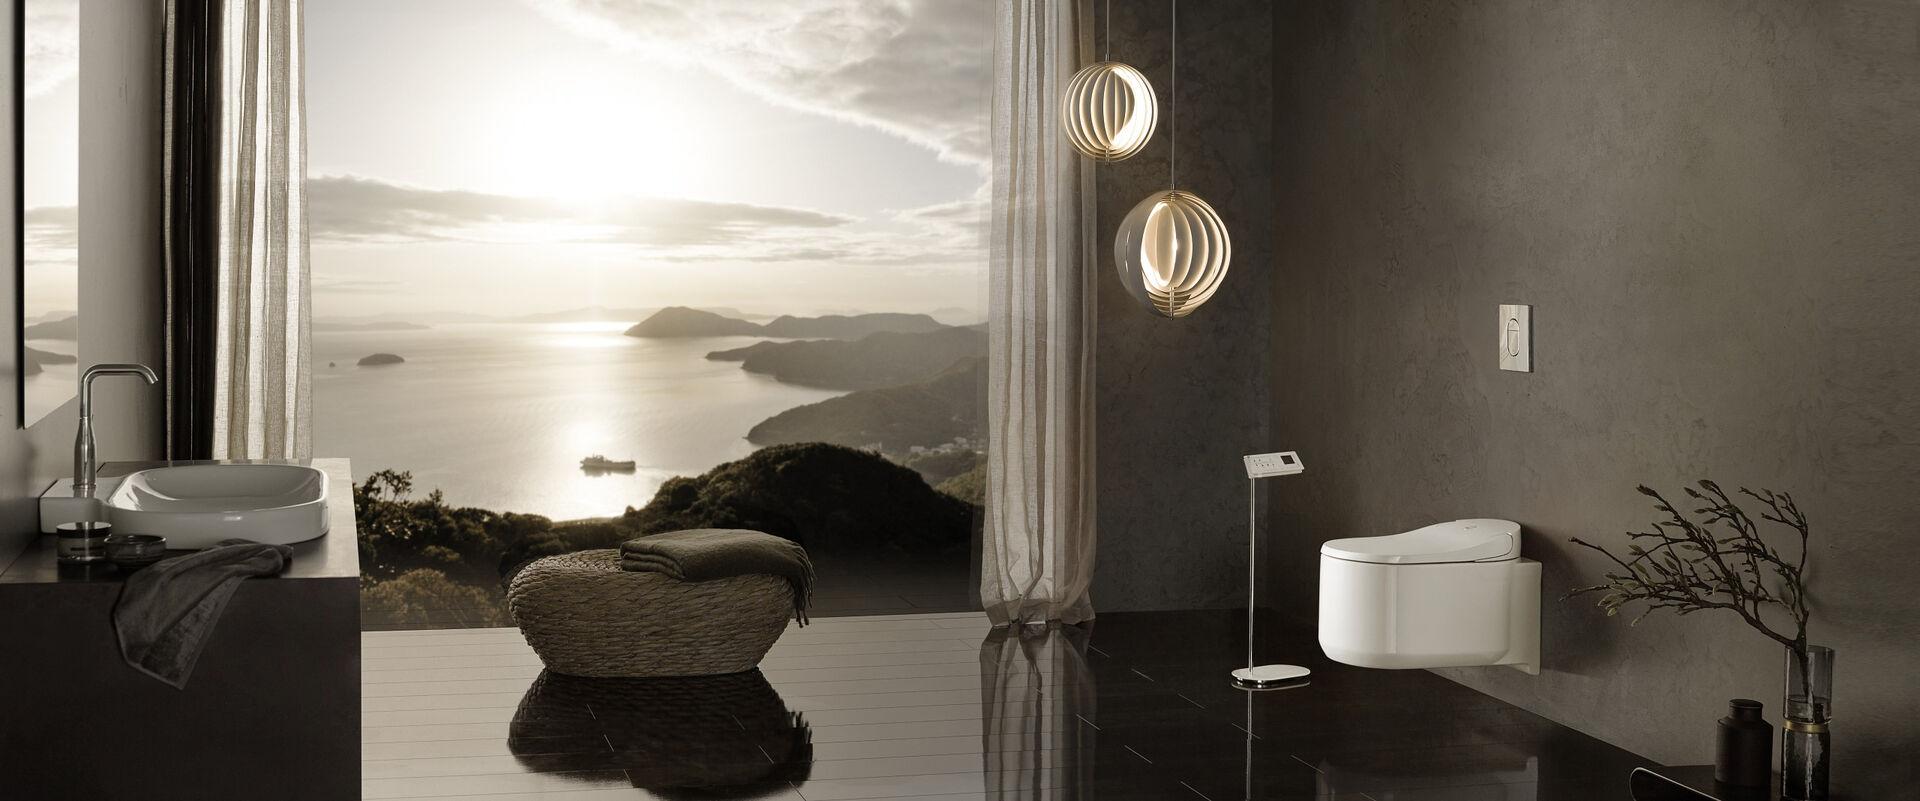 grohe sensia arena das pr mierte dusch wc mit smarten details. Black Bedroom Furniture Sets. Home Design Ideas